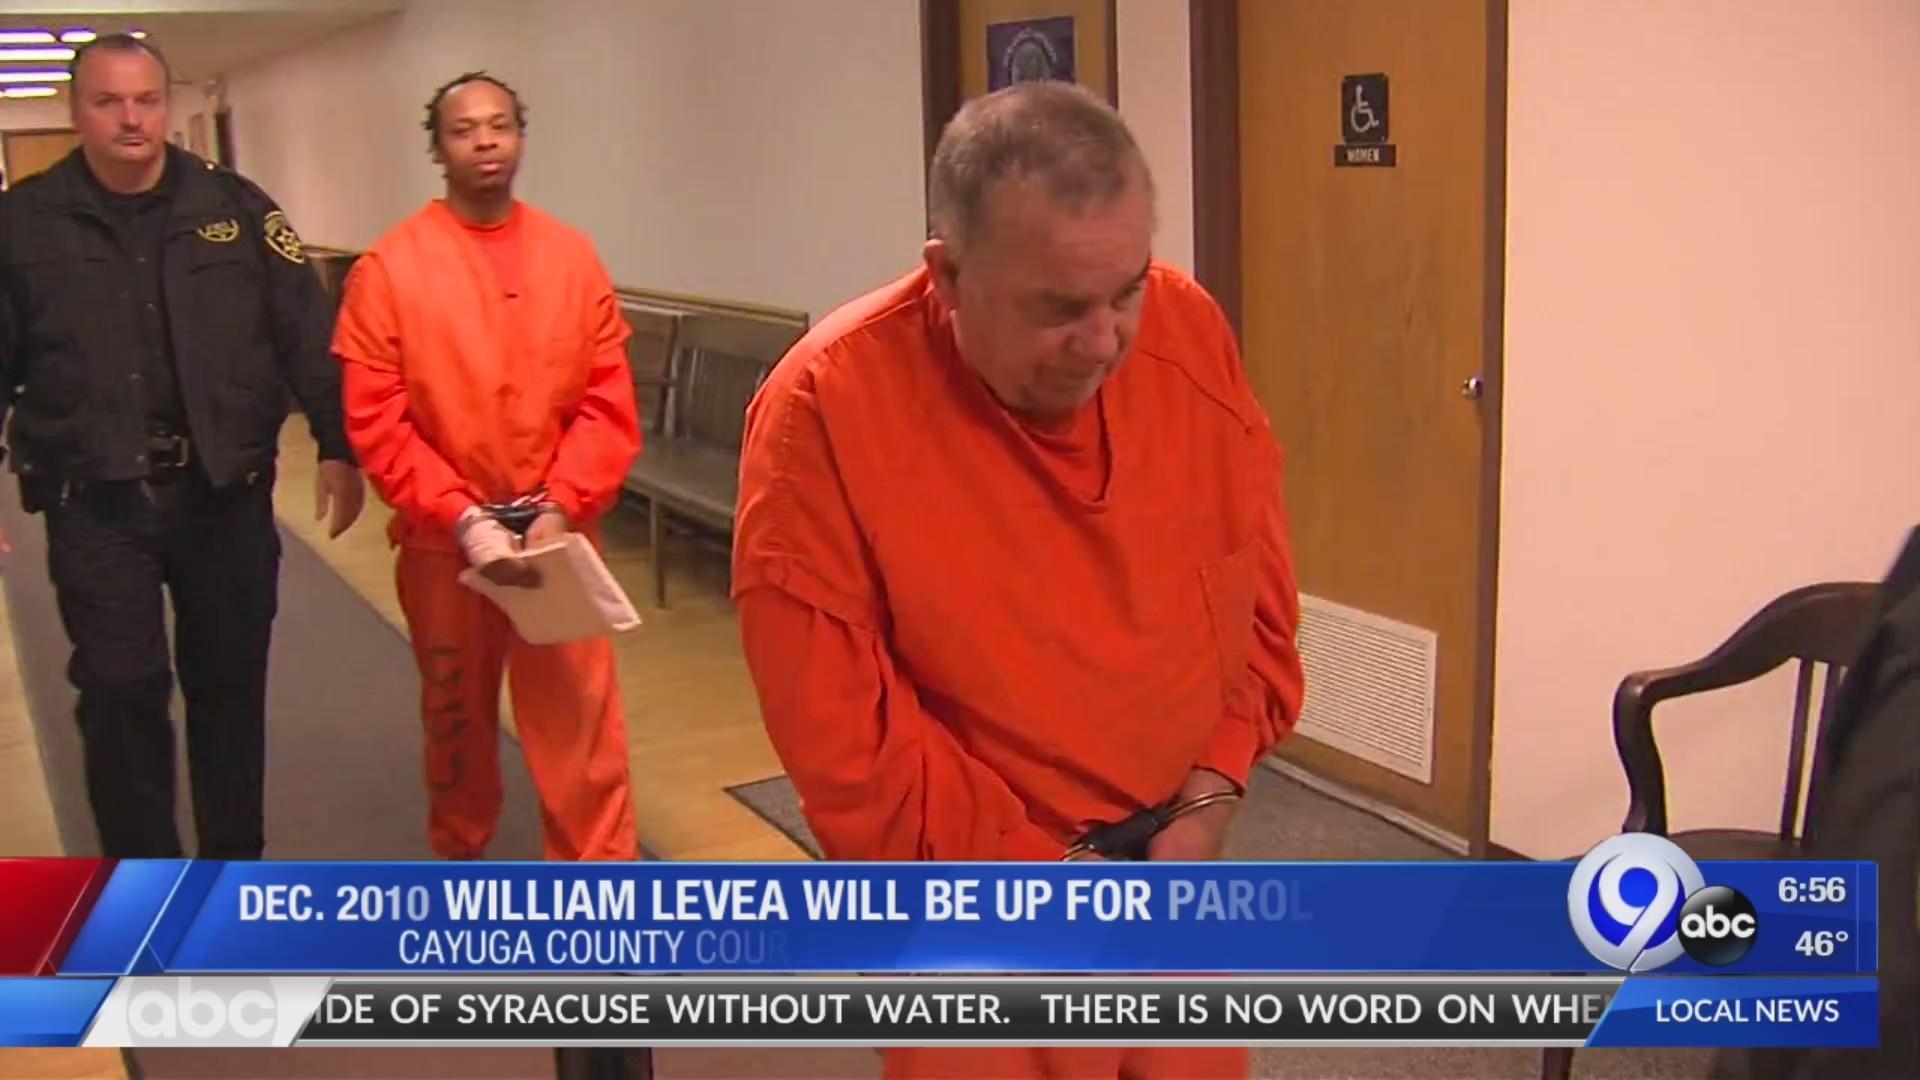 William LeVea up for parole